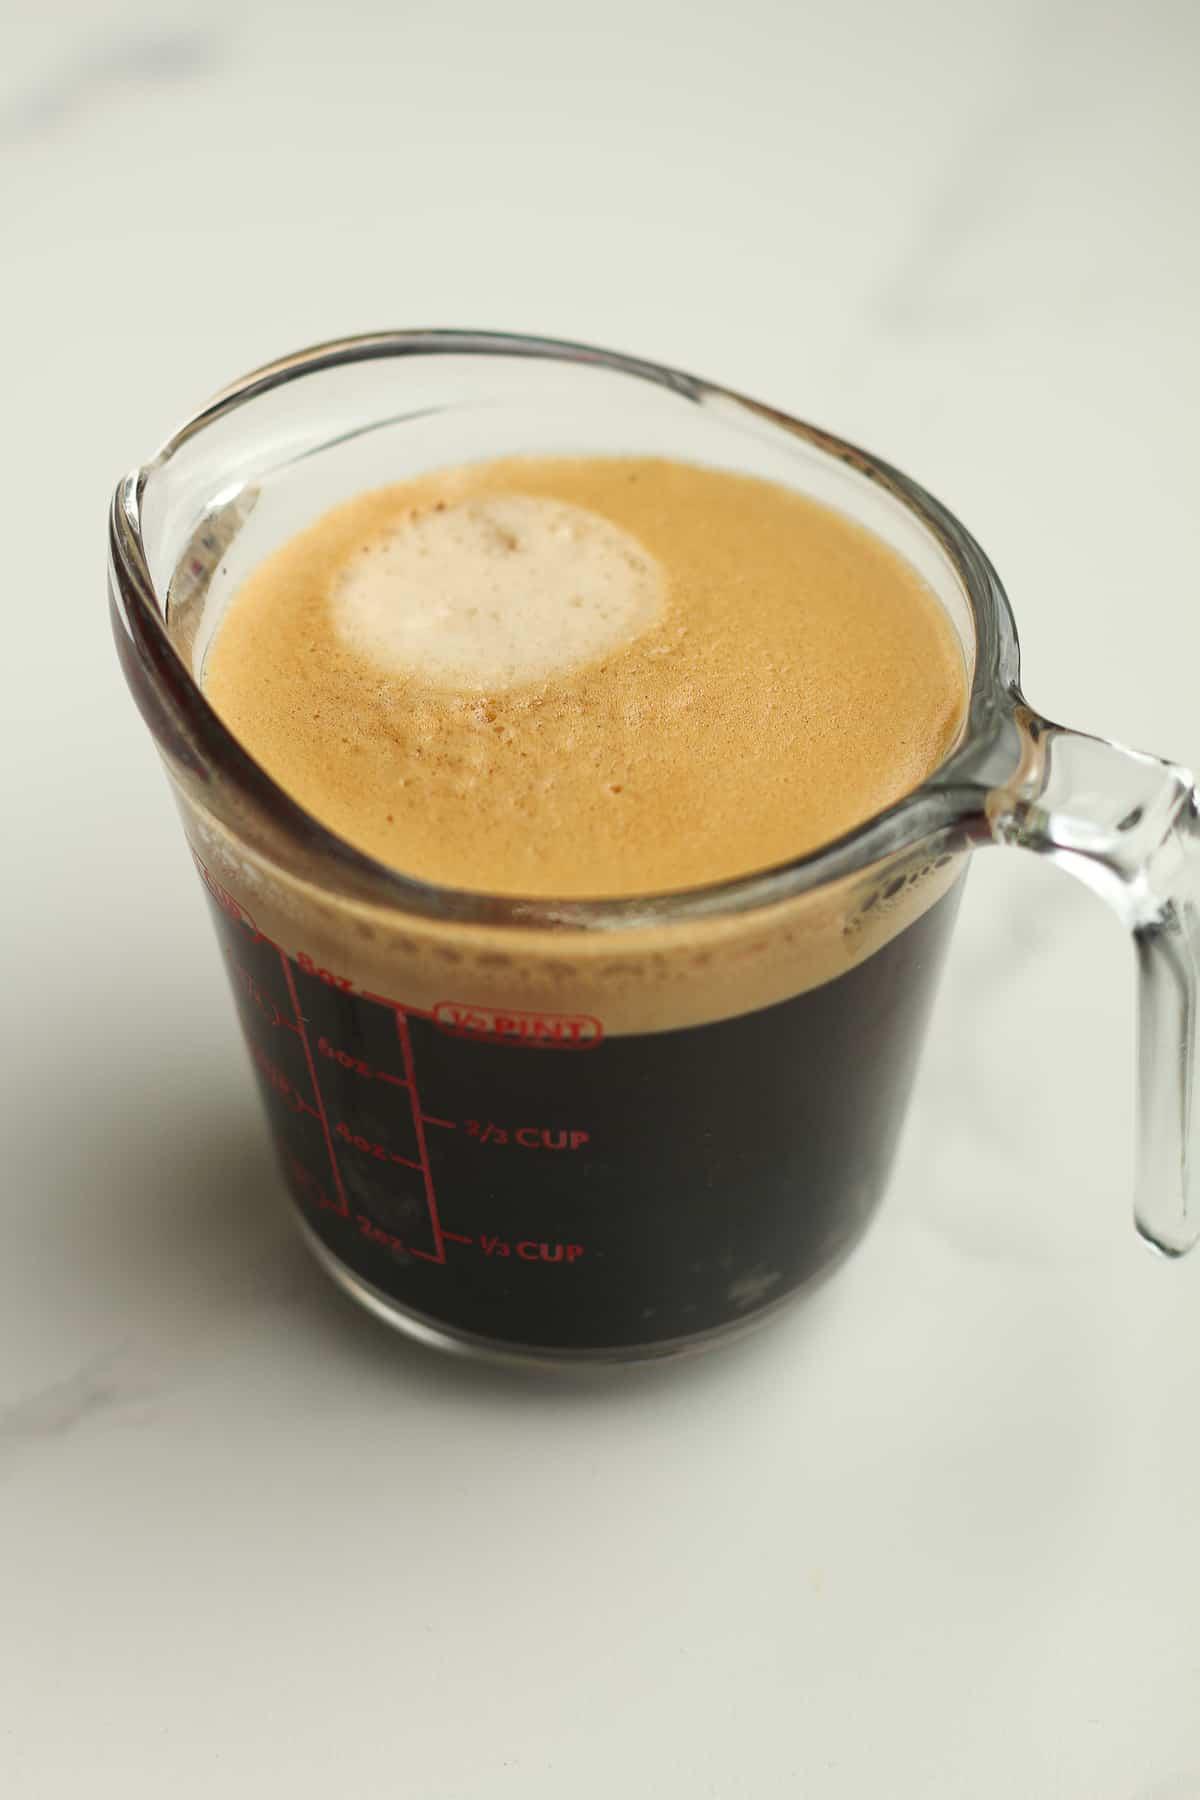 A cup of espresso.